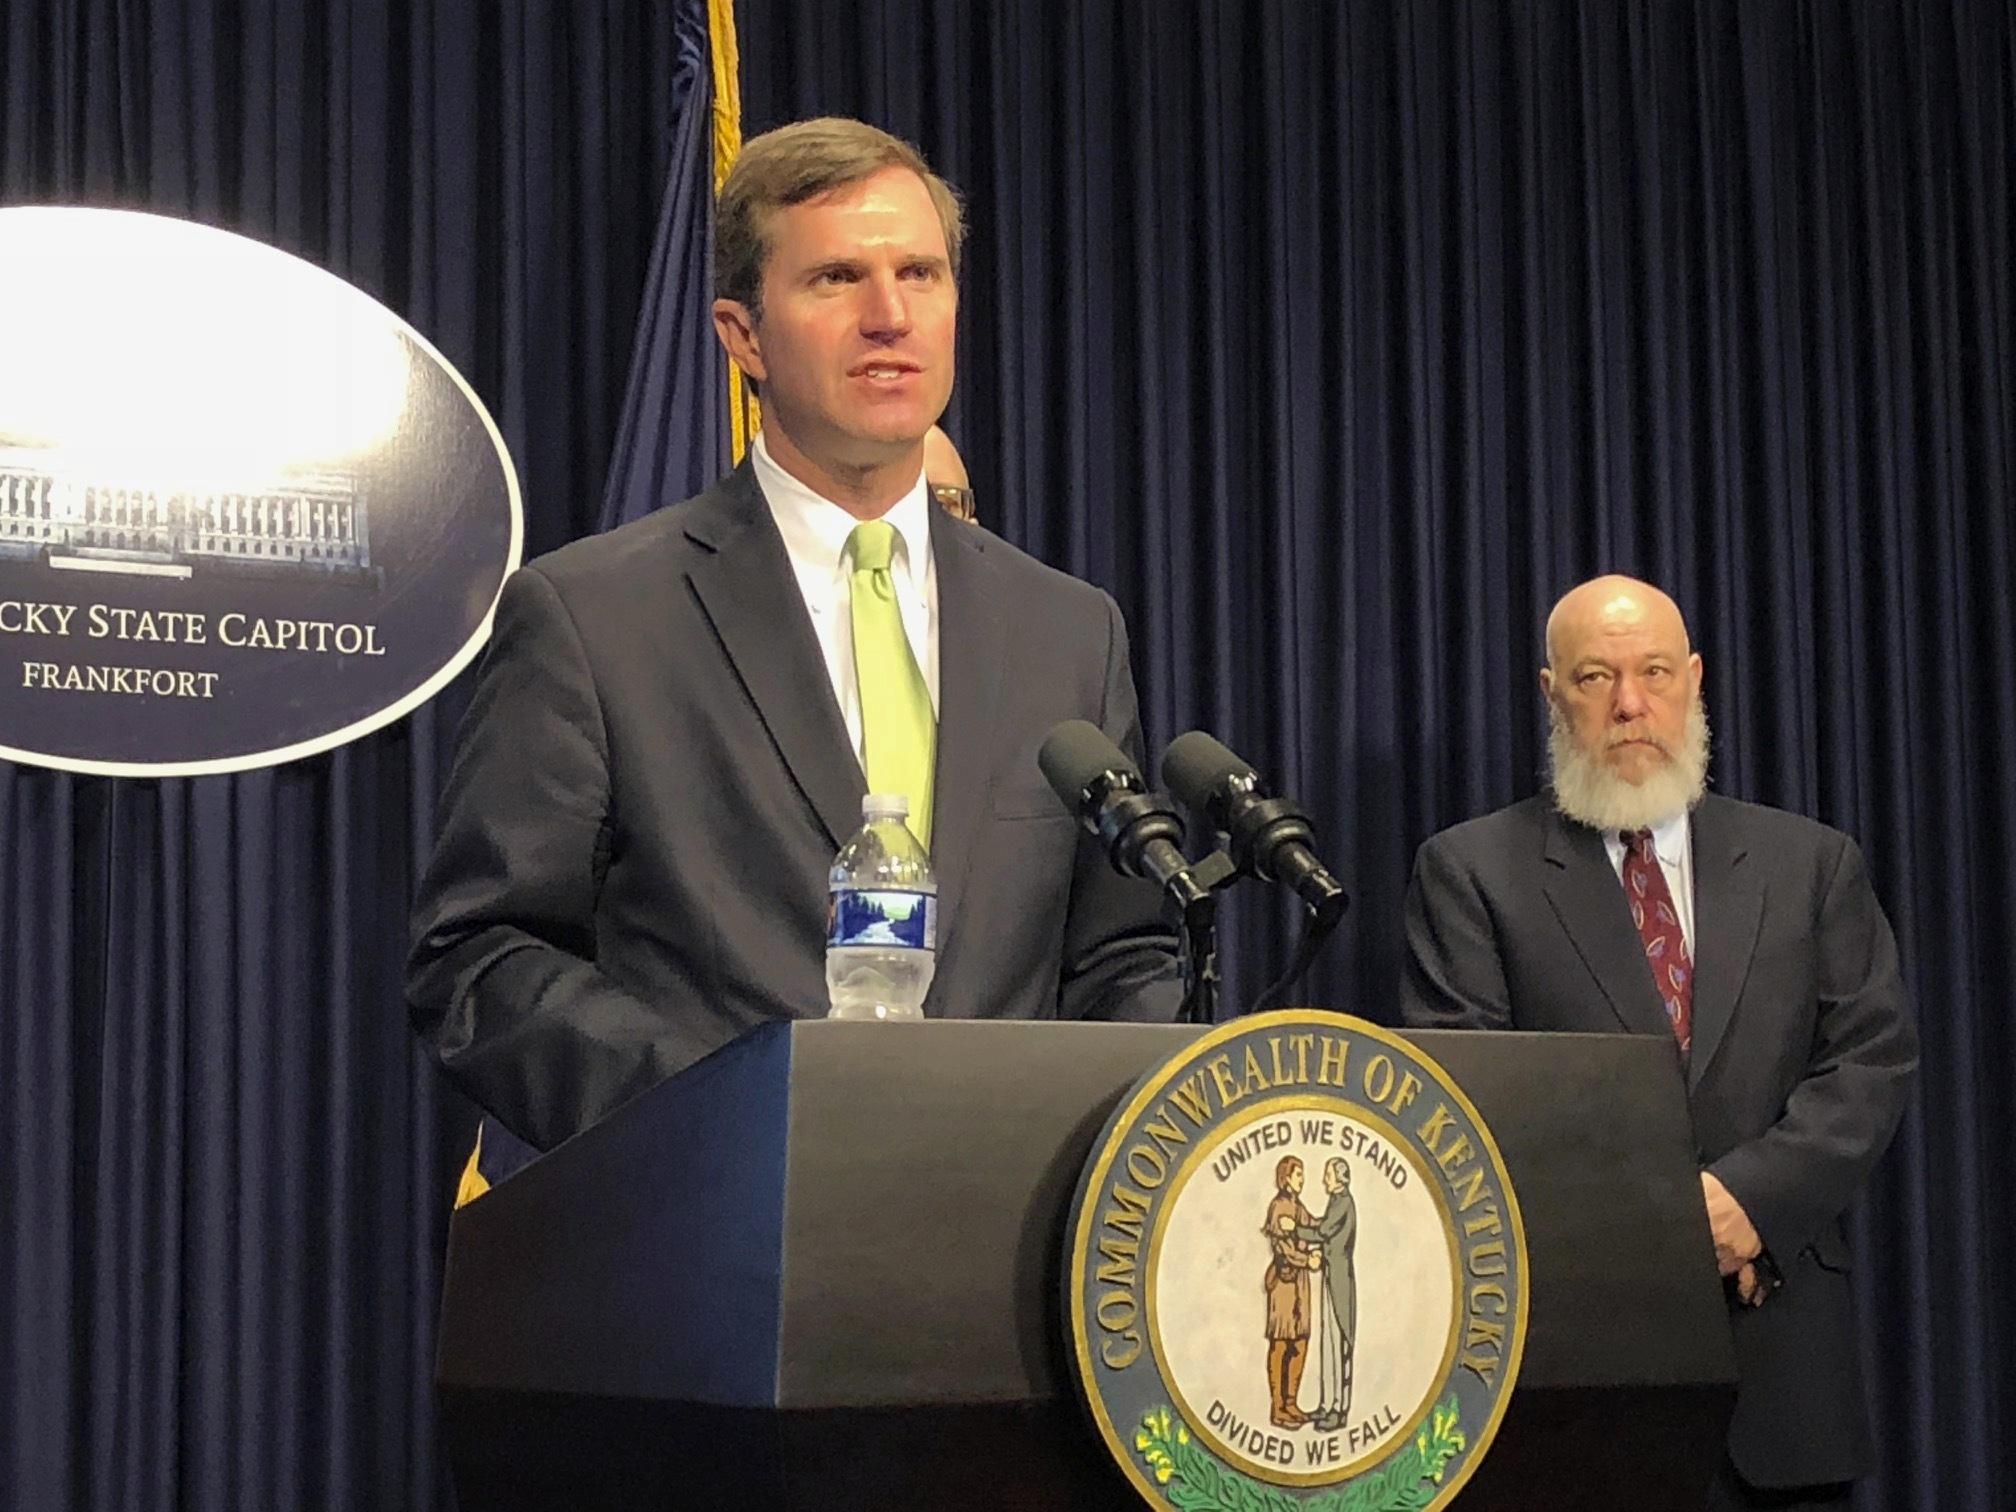 Kentuckian Tests Positive After 'Coronavirus Party,' Governor Says